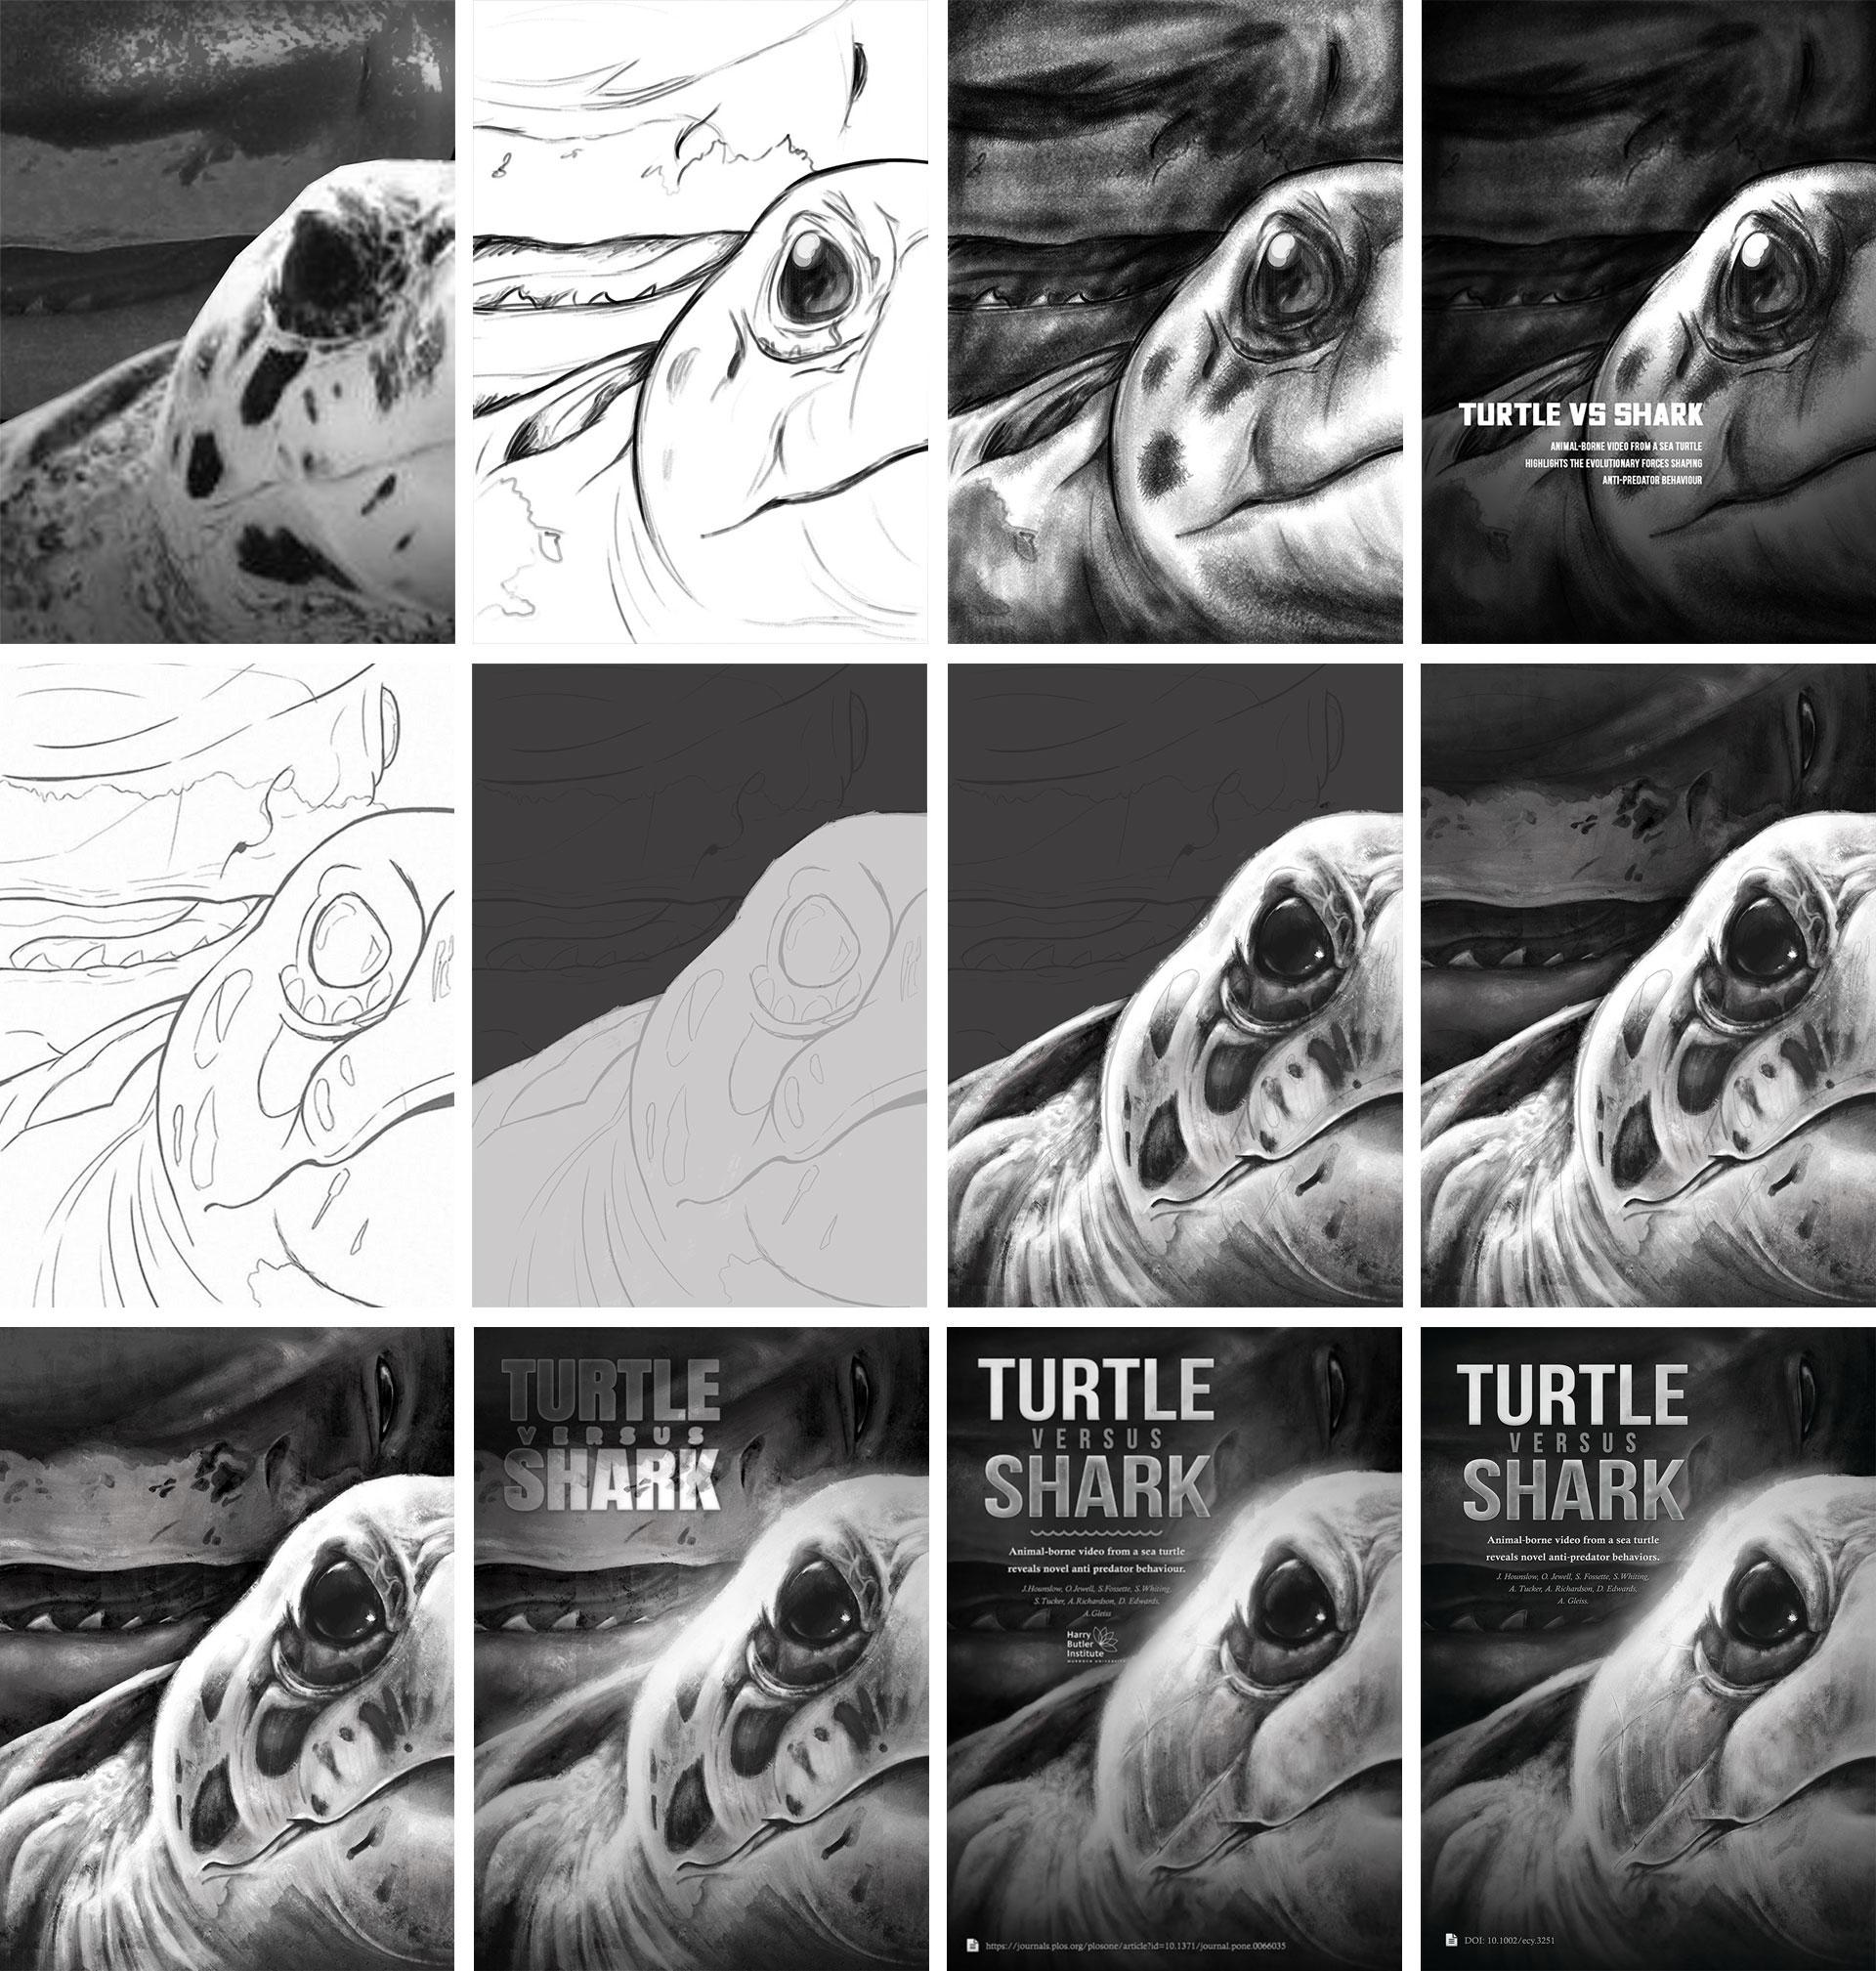 Turtle versus Shark artwork development